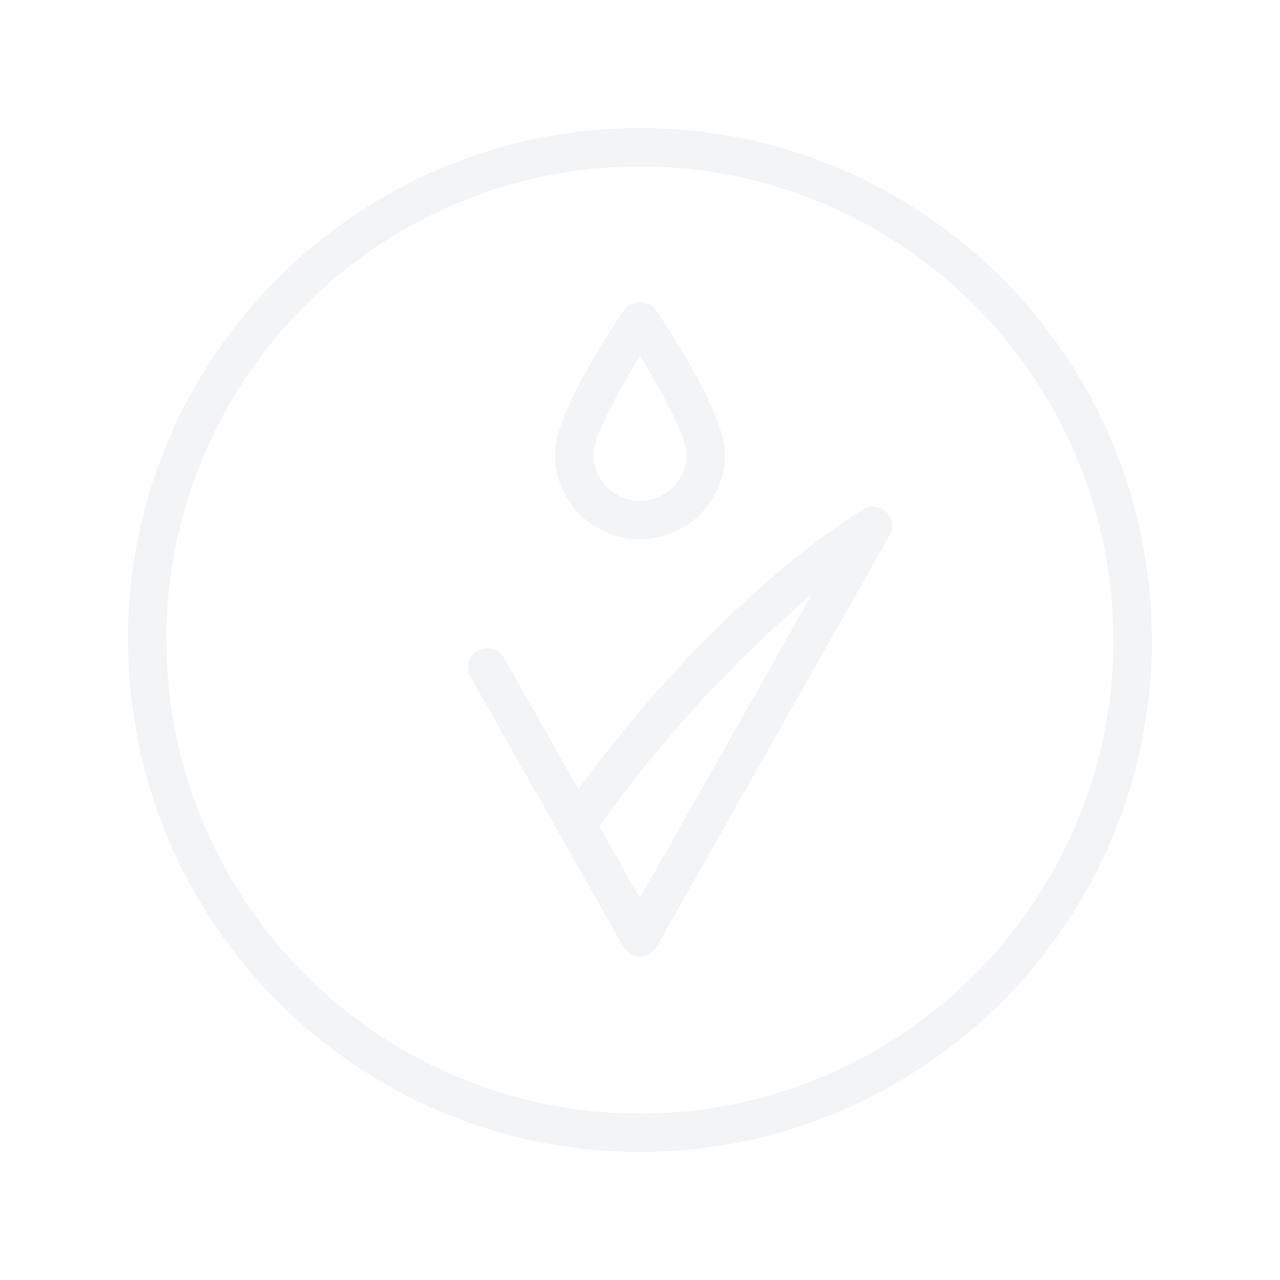 IDUN Minerals Waterproof Mascara Eir 10ml